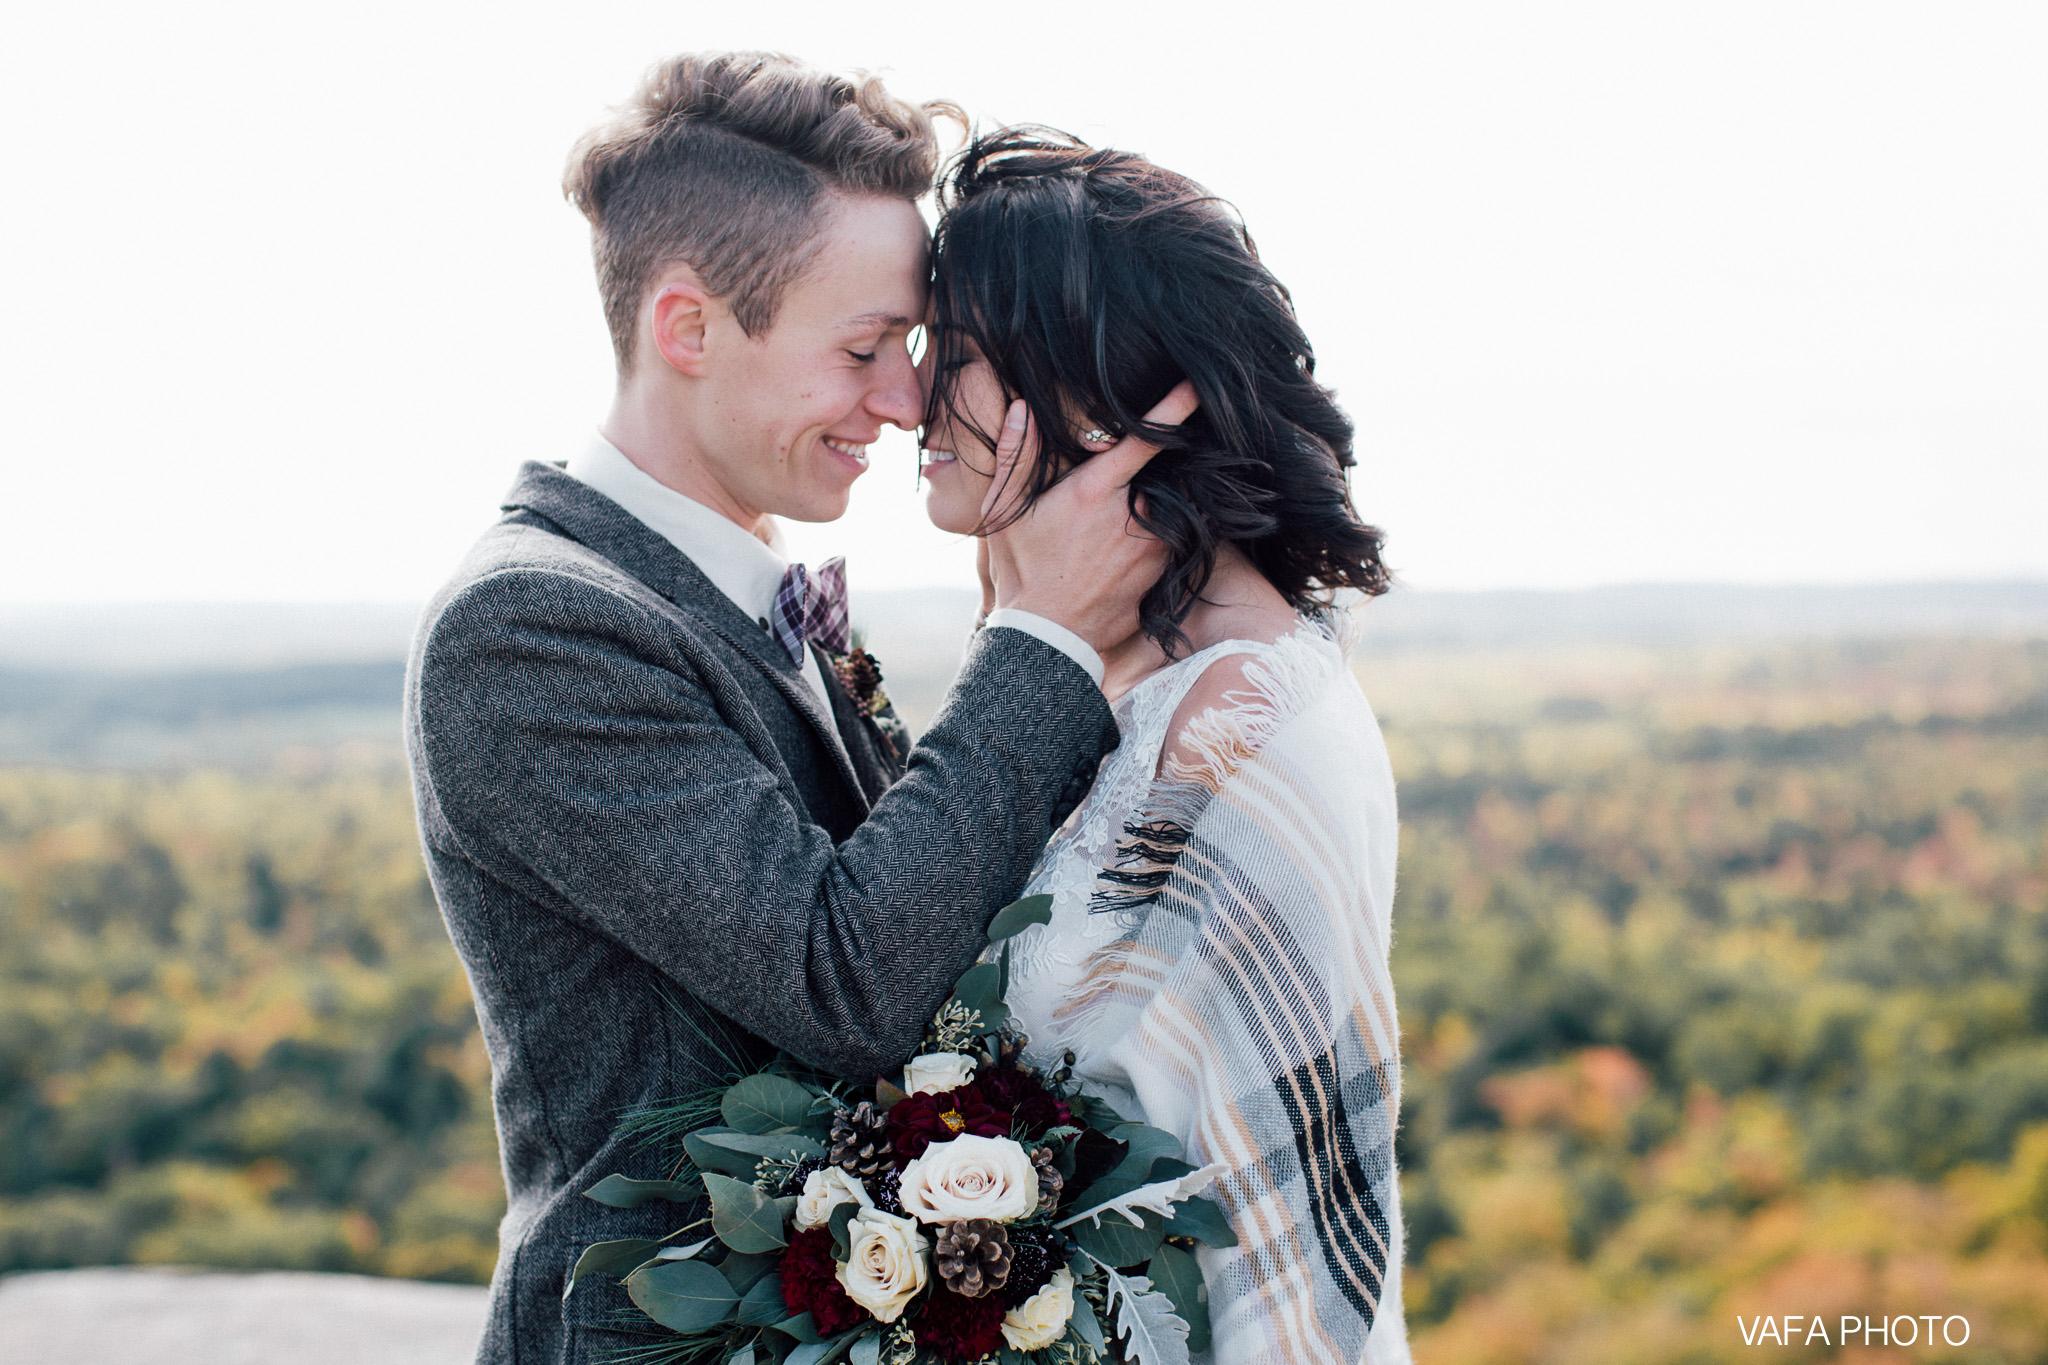 Hogback-Mountain-Wedding-Chelsea-Josh-Vafa-Photo-441.jpg